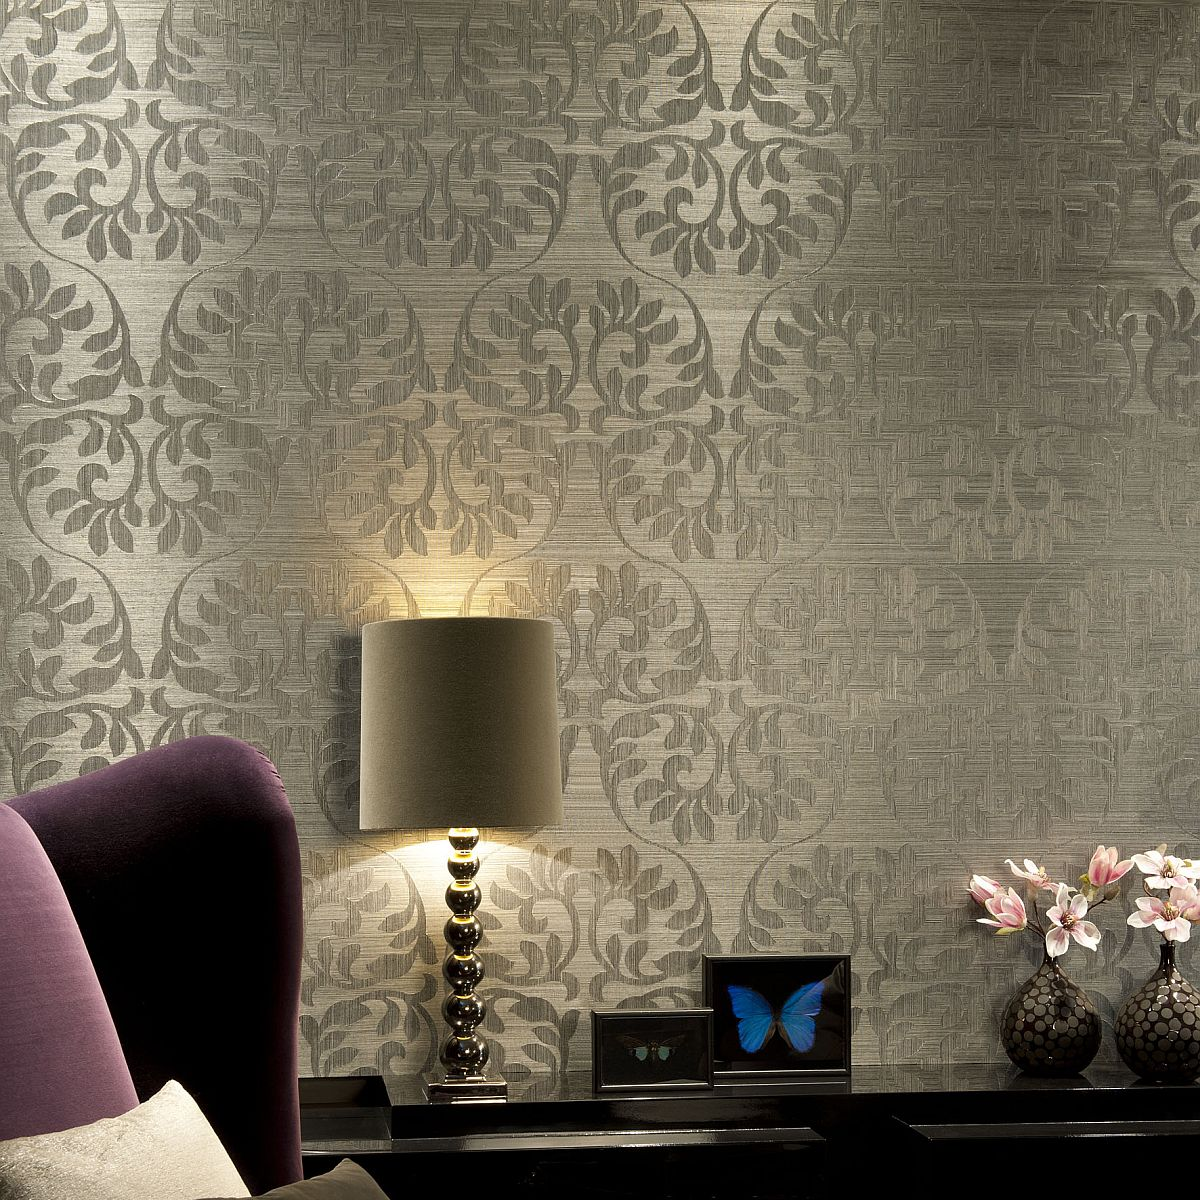 vlies sisal tapete heliodor leaf silber grau 49052 heliodor decowunder. Black Bedroom Furniture Sets. Home Design Ideas